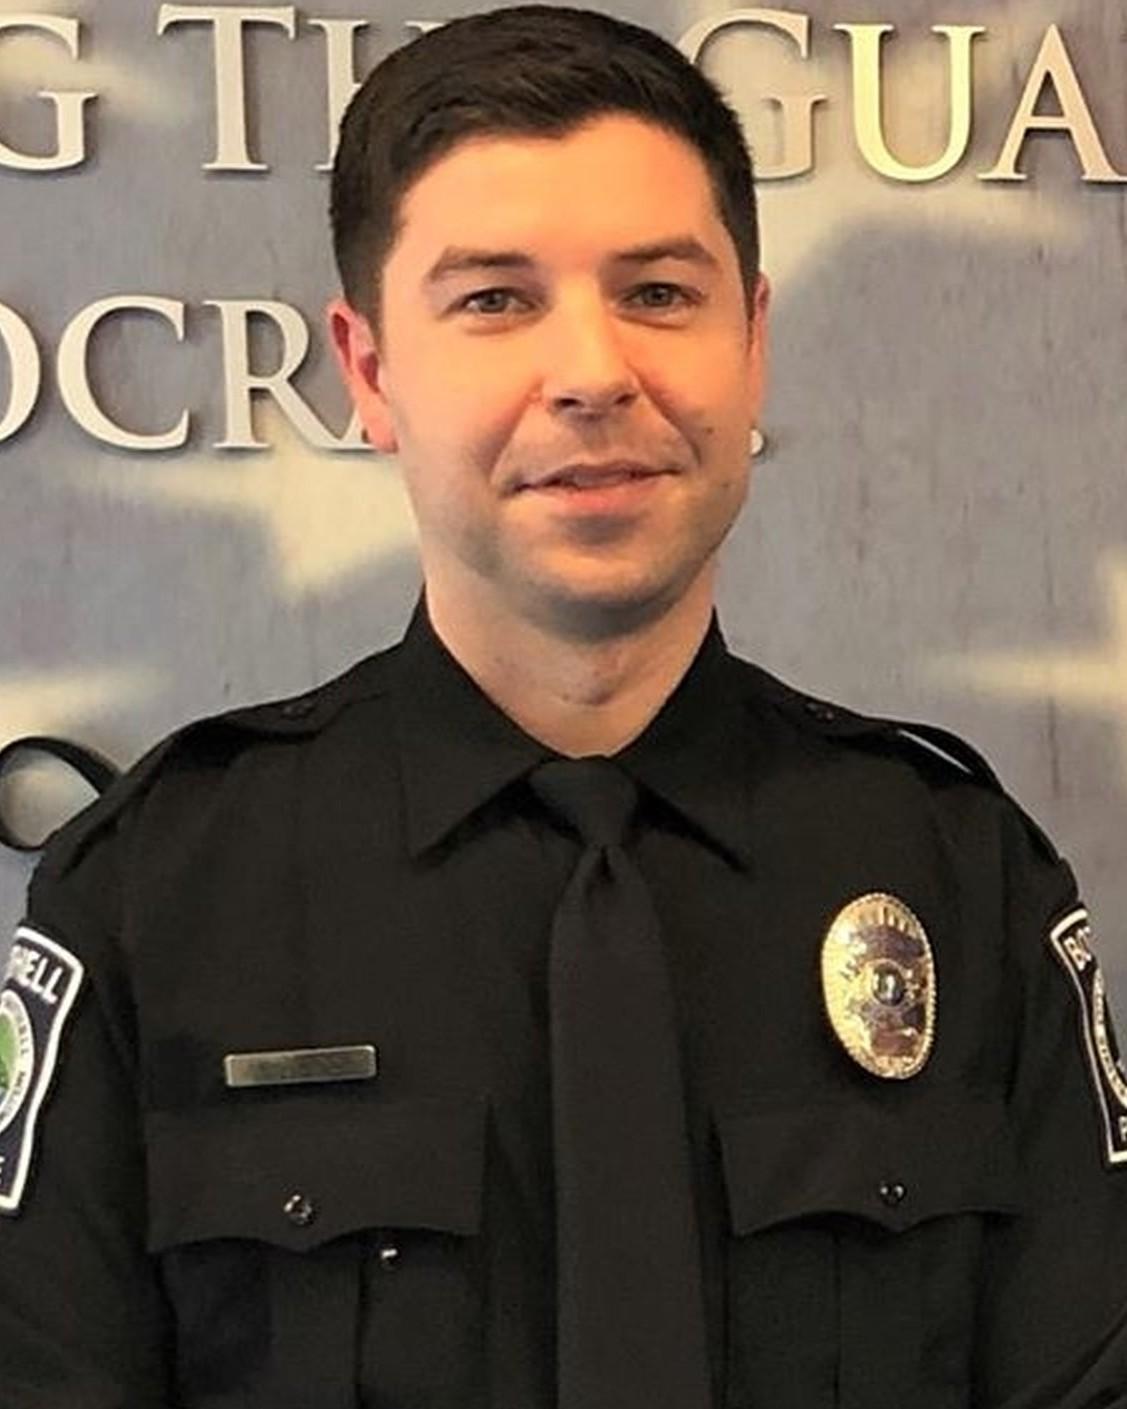 Police Officer Jonathan P. Shoop